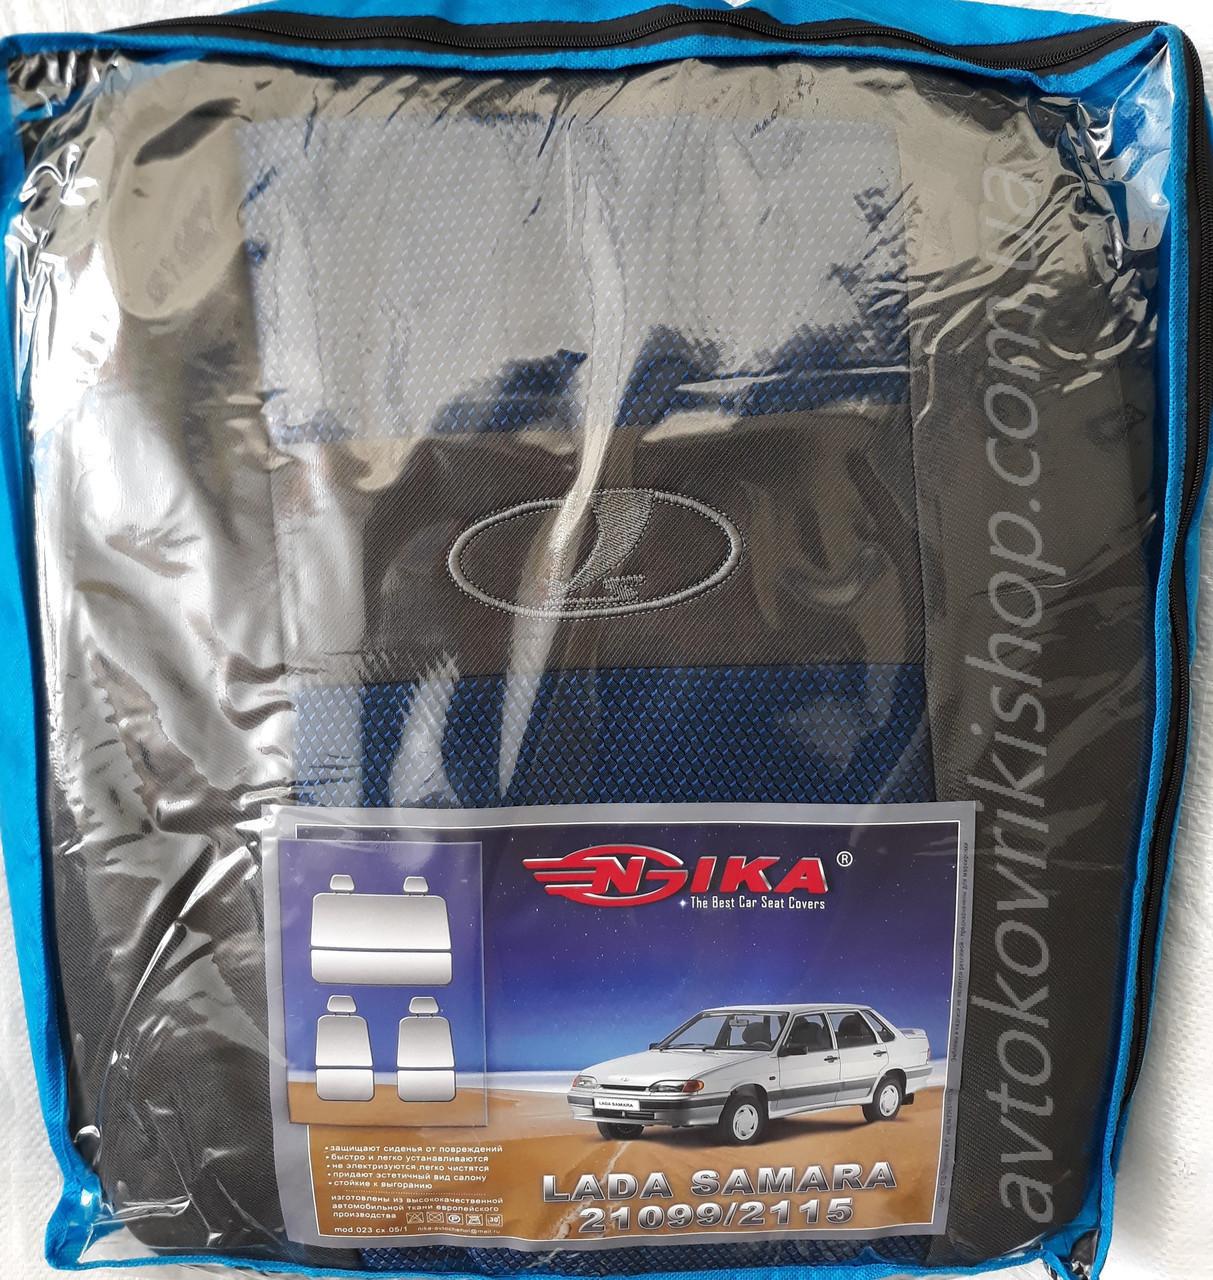 Авто чохли Lada Samara 21099 / 2115 MAX (синій) Nika